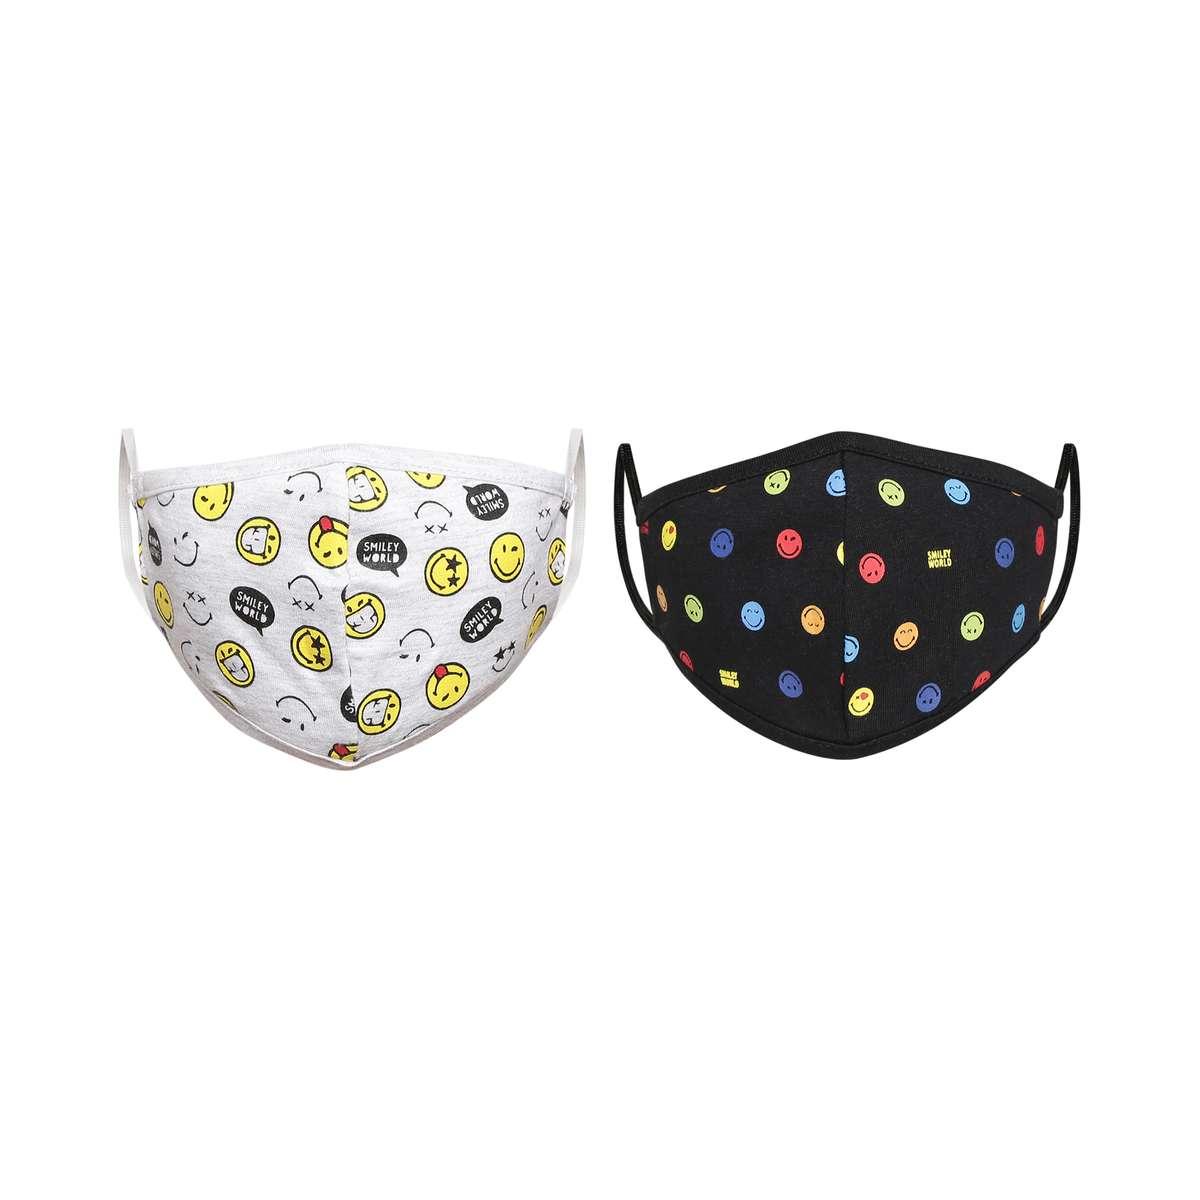 2.SMILEYWORLD Kids Printed Reusable Face Mask - Pack of 2